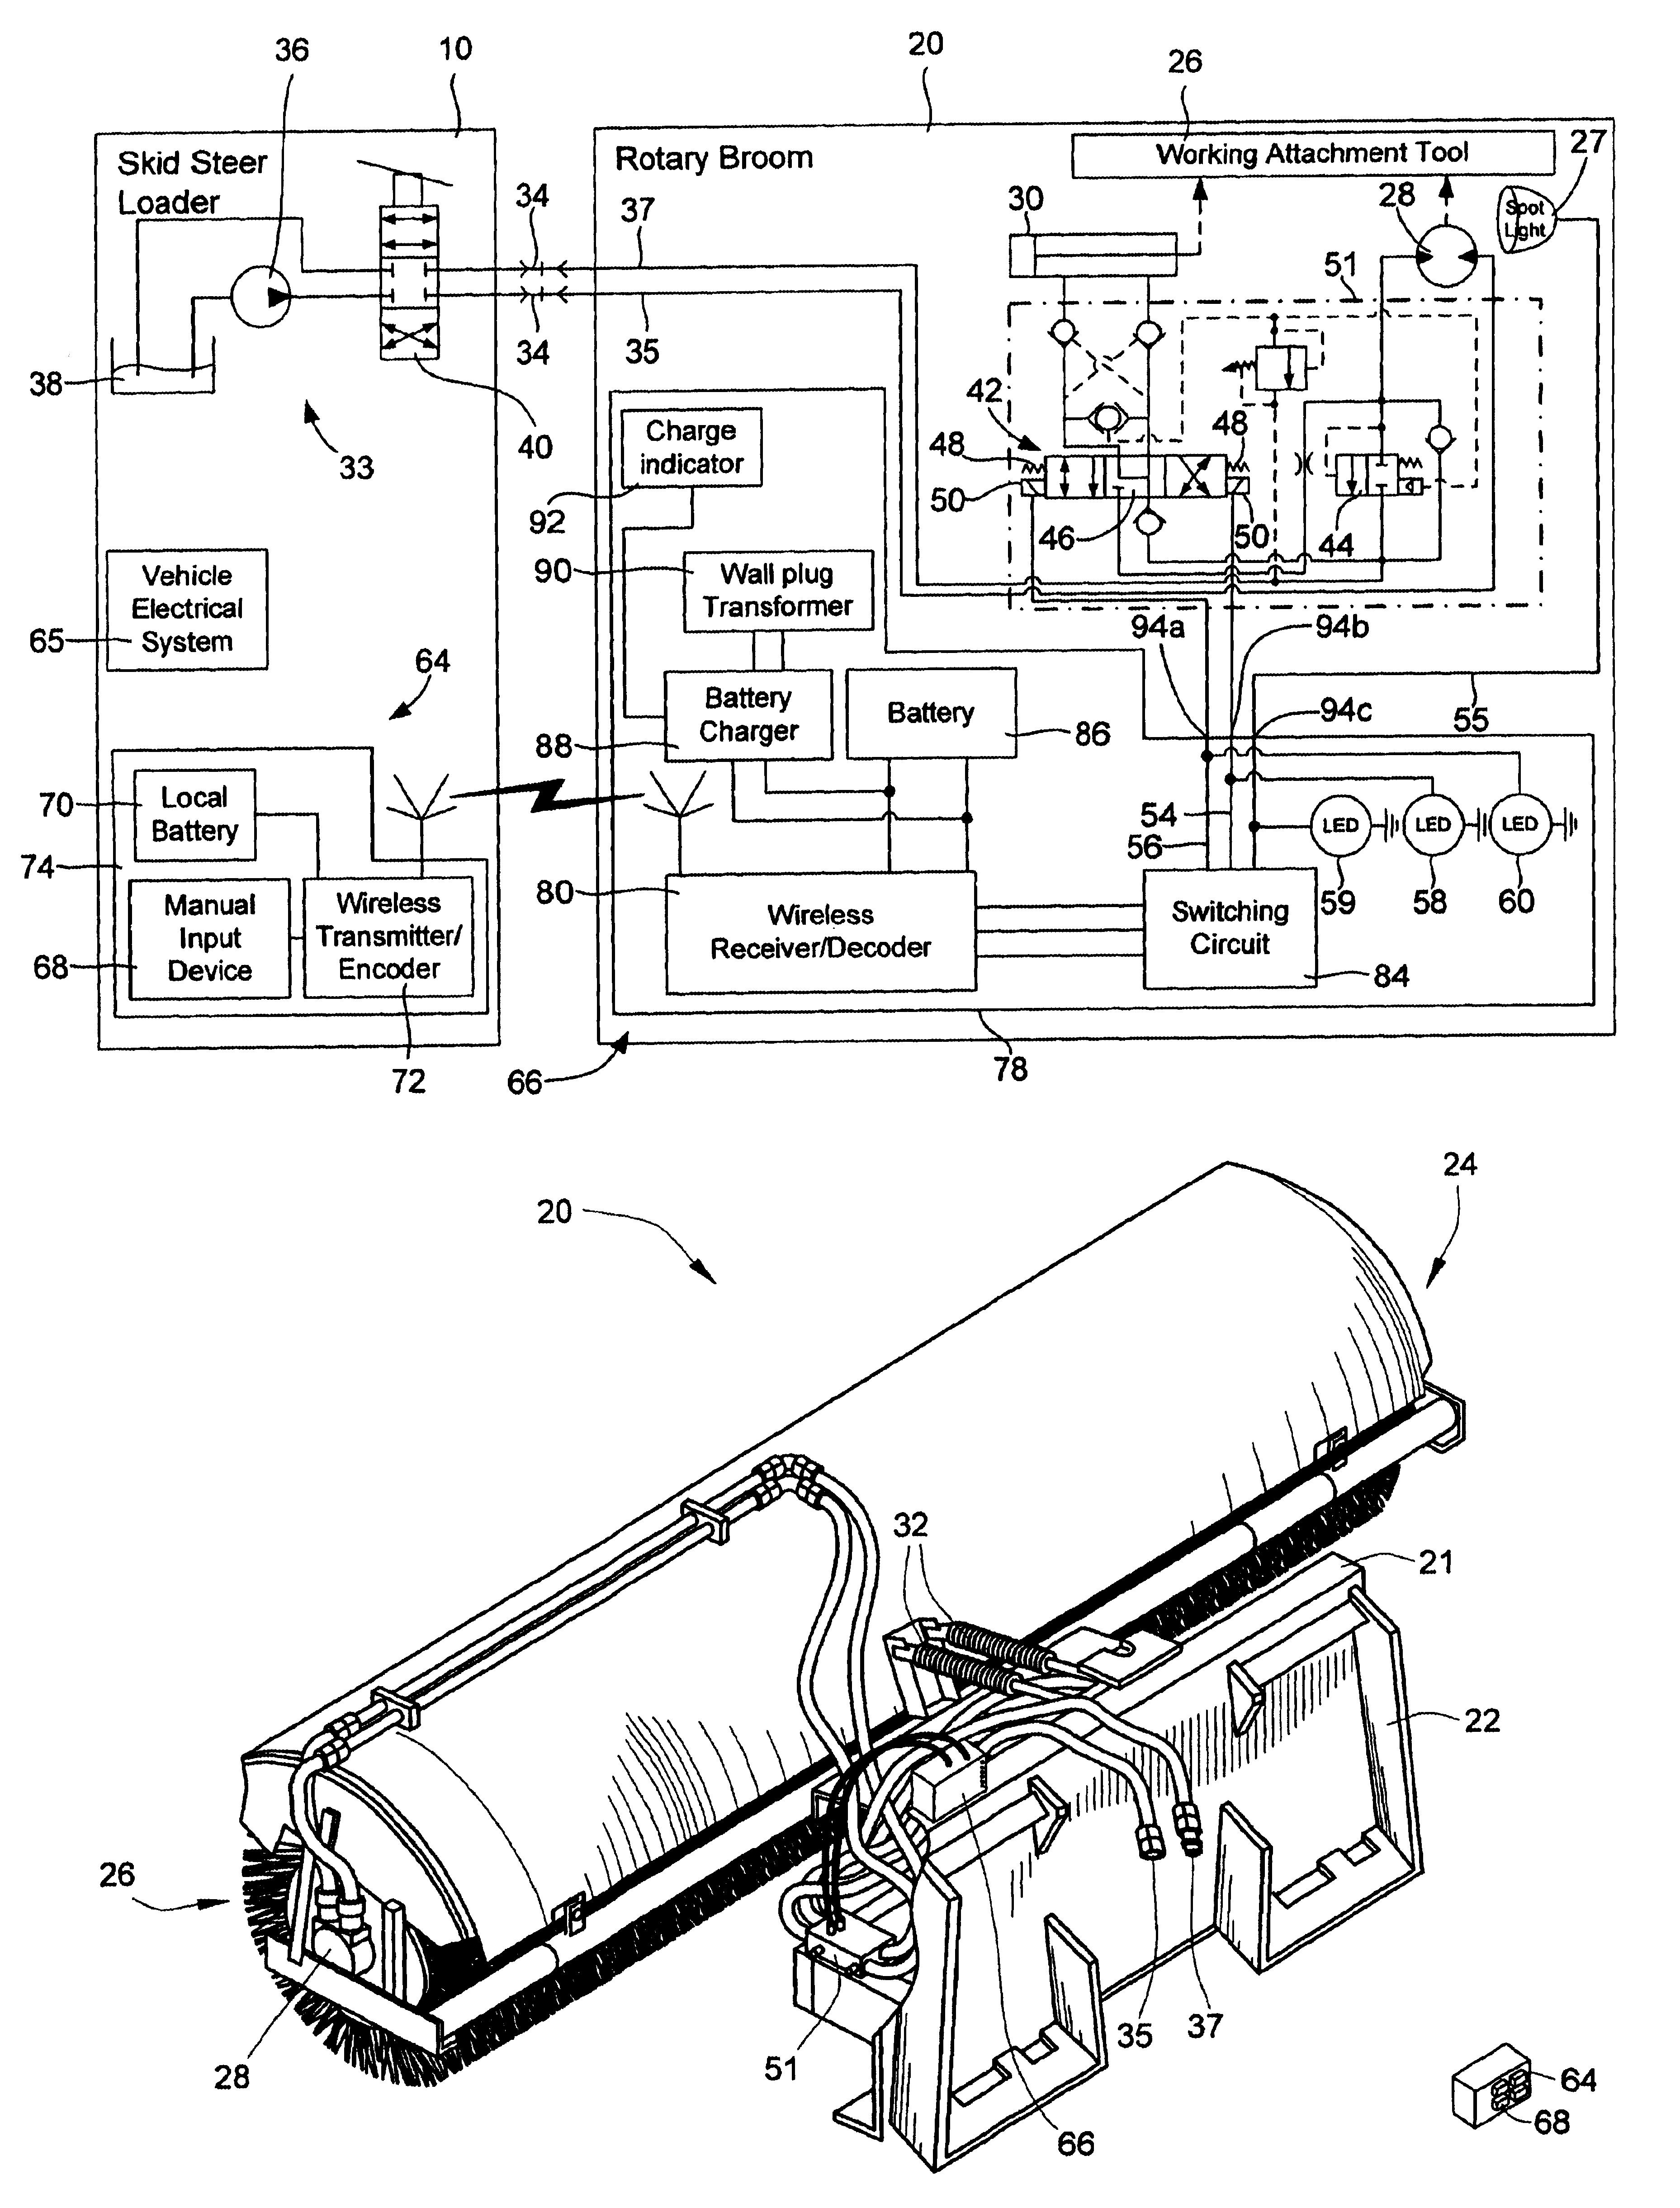 DIAGRAM] Wiring Diagram Bobcat Angle Broom - Poulan Pro Wiring Schematic  List diagnose.mon1erinstrument.frmon1erinstrument.fr